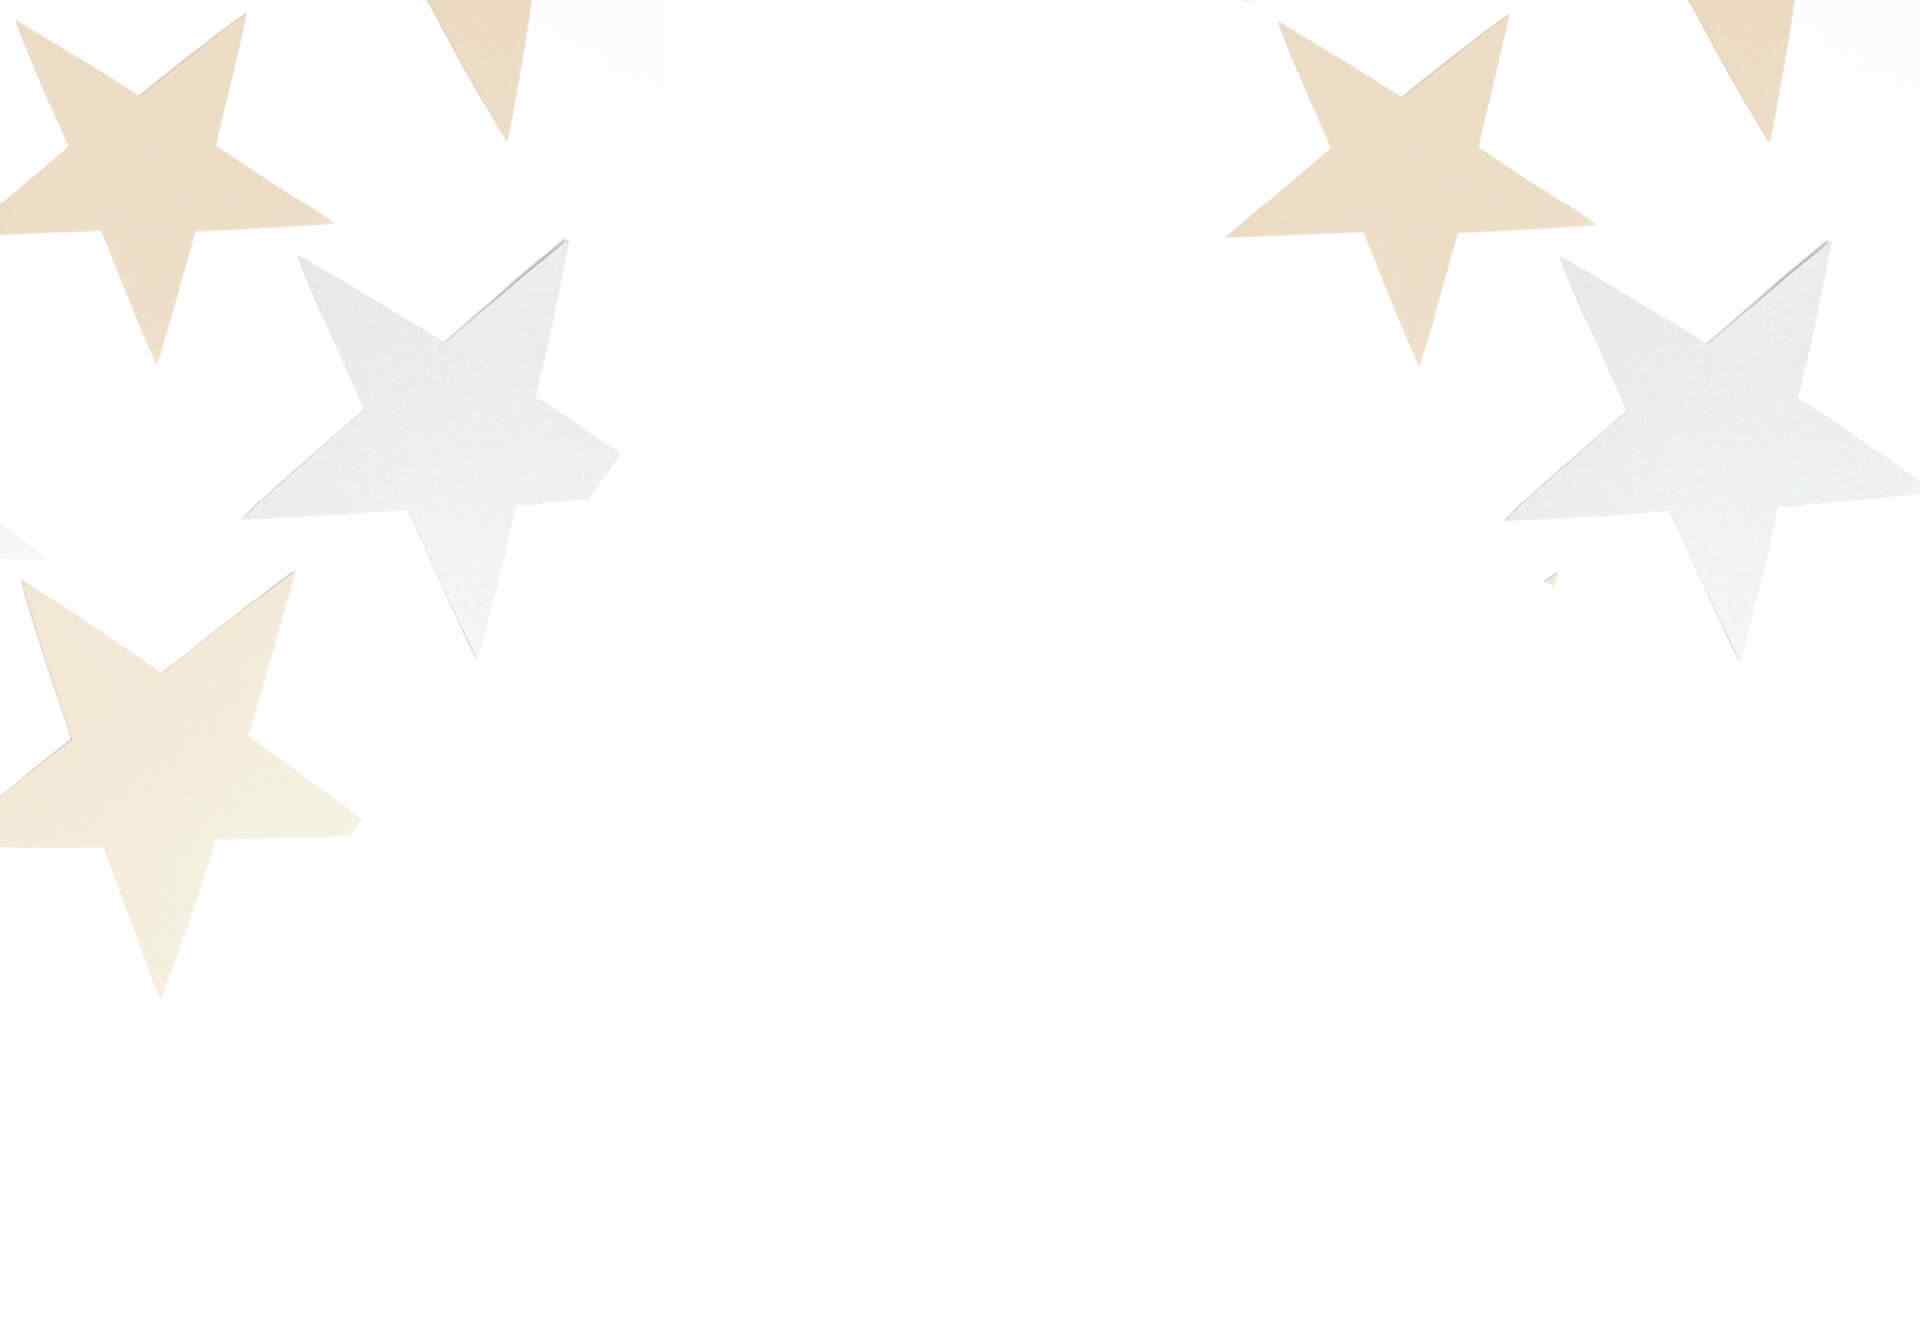 https://www.musikschule-heiligenhaus.de/wp-content/uploads/2019/05/background_stars.jpg